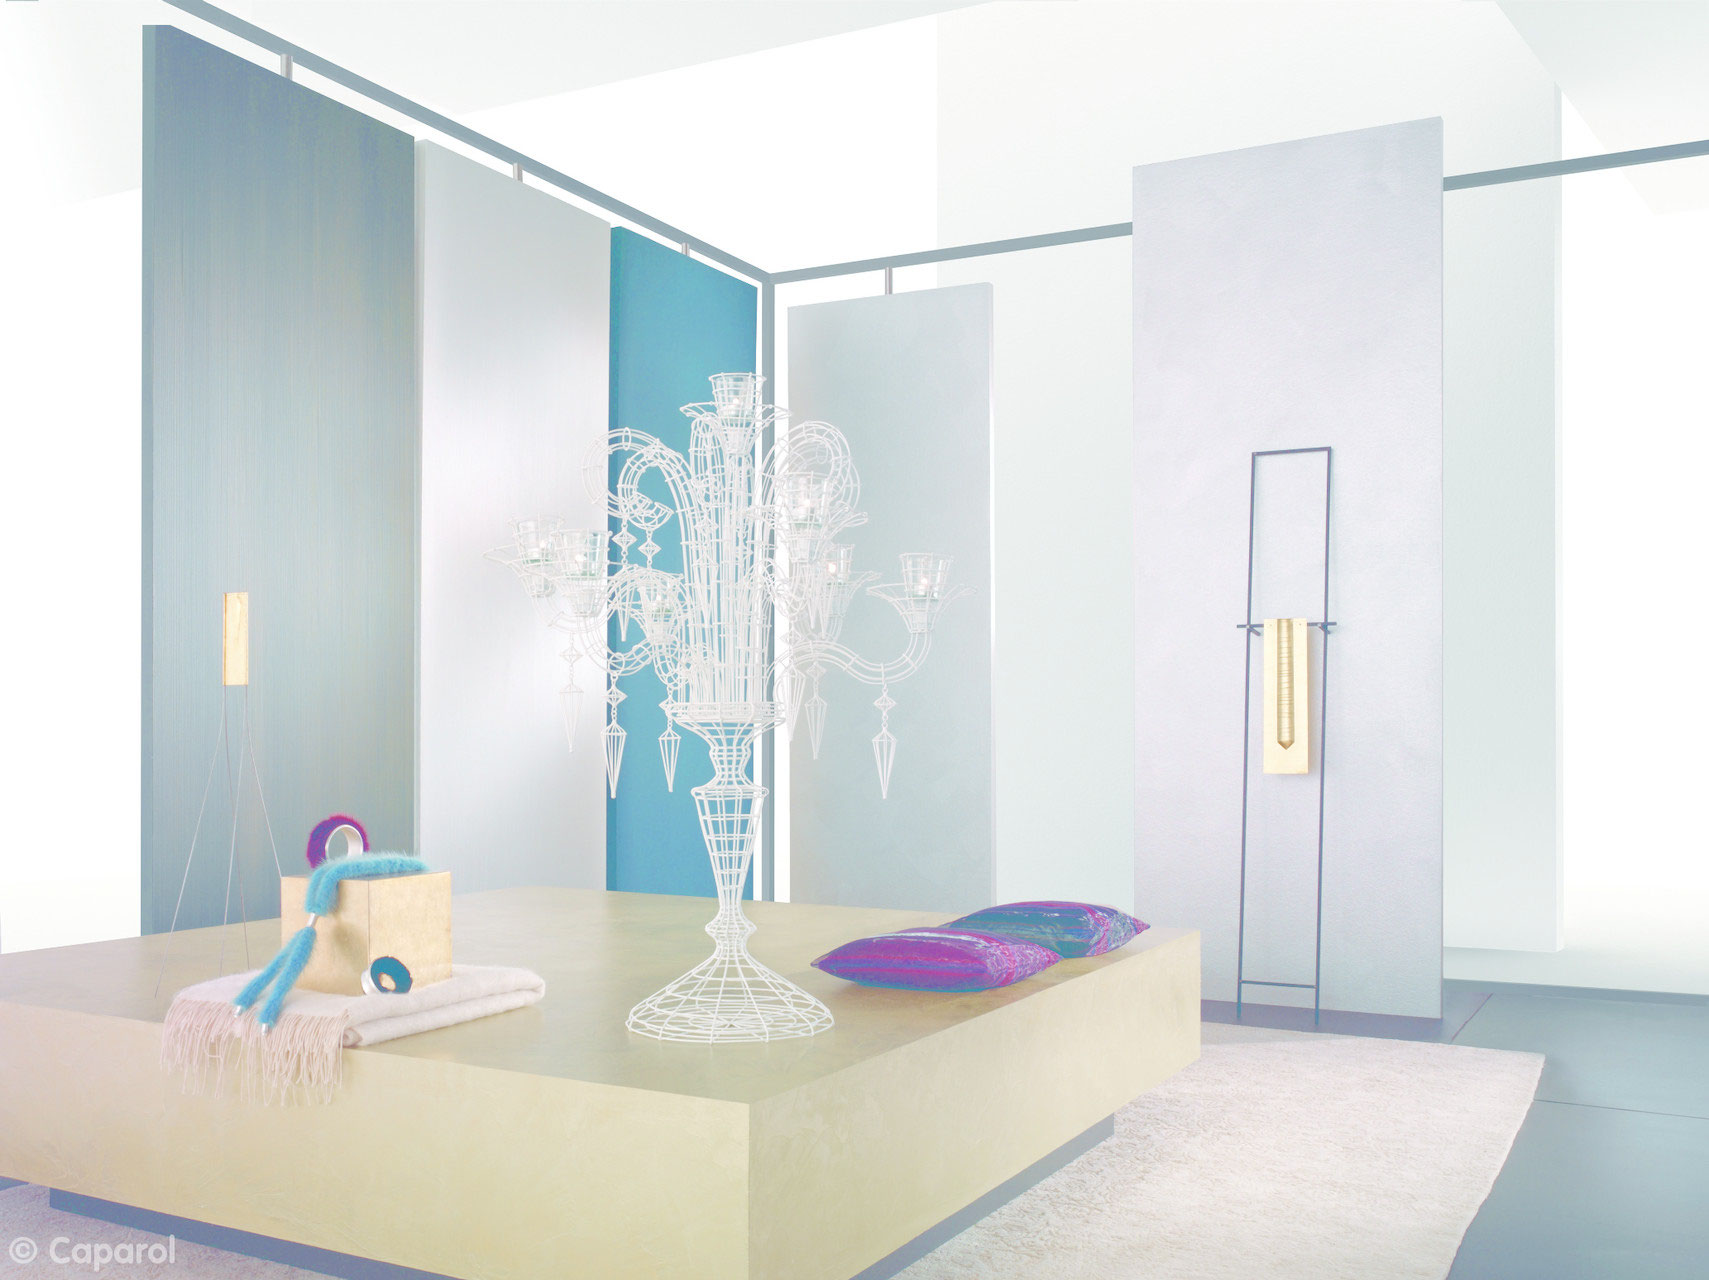 malerbetriebe in mannheim malerbetrieb beyerl webseite. Black Bedroom Furniture Sets. Home Design Ideas